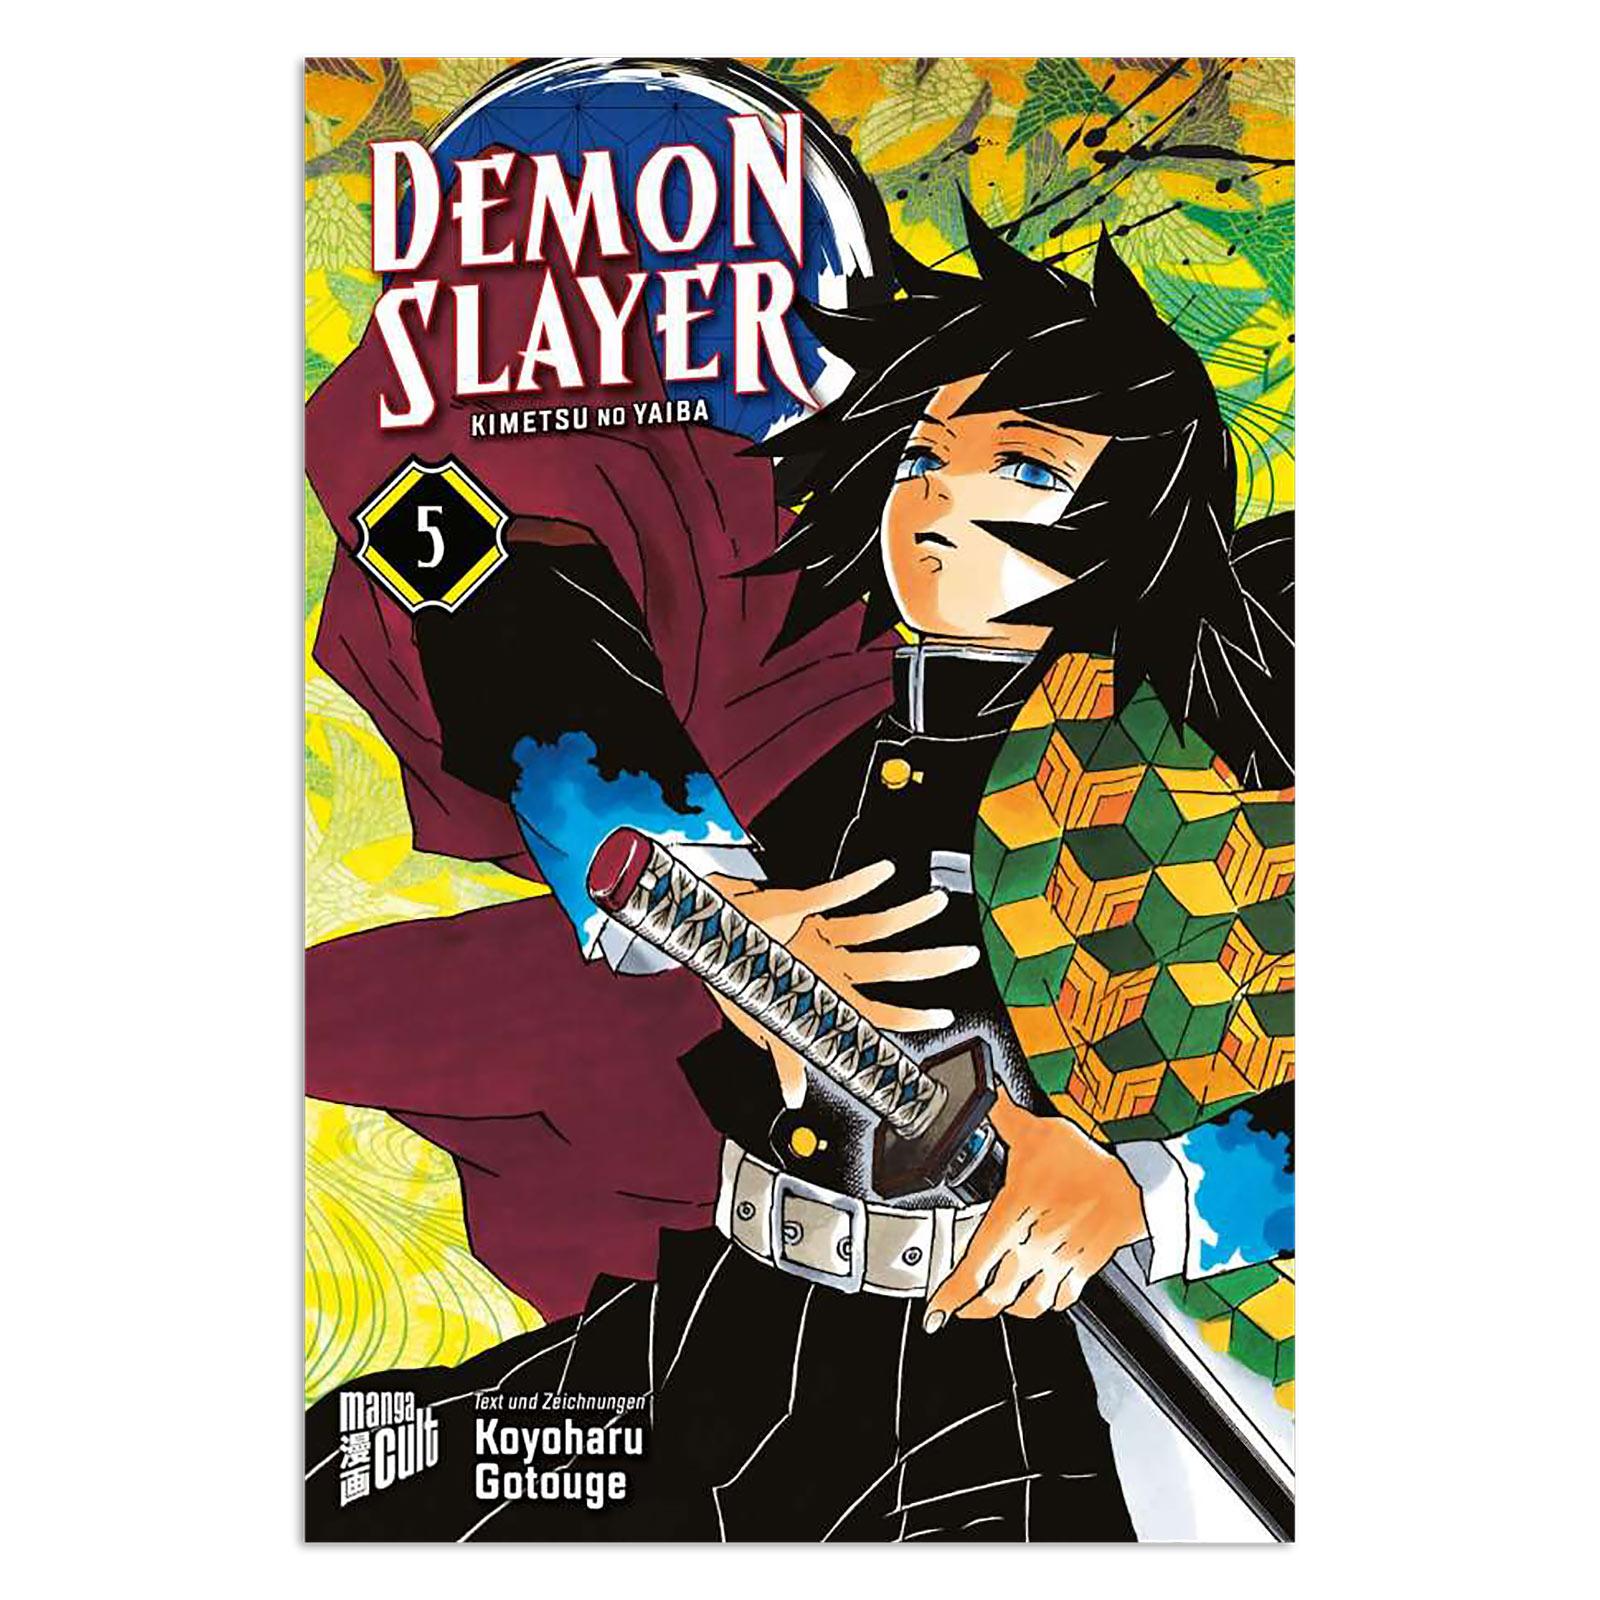 Demon Slayer - Kimetsu no yaiba Band 5 Taschenbuch